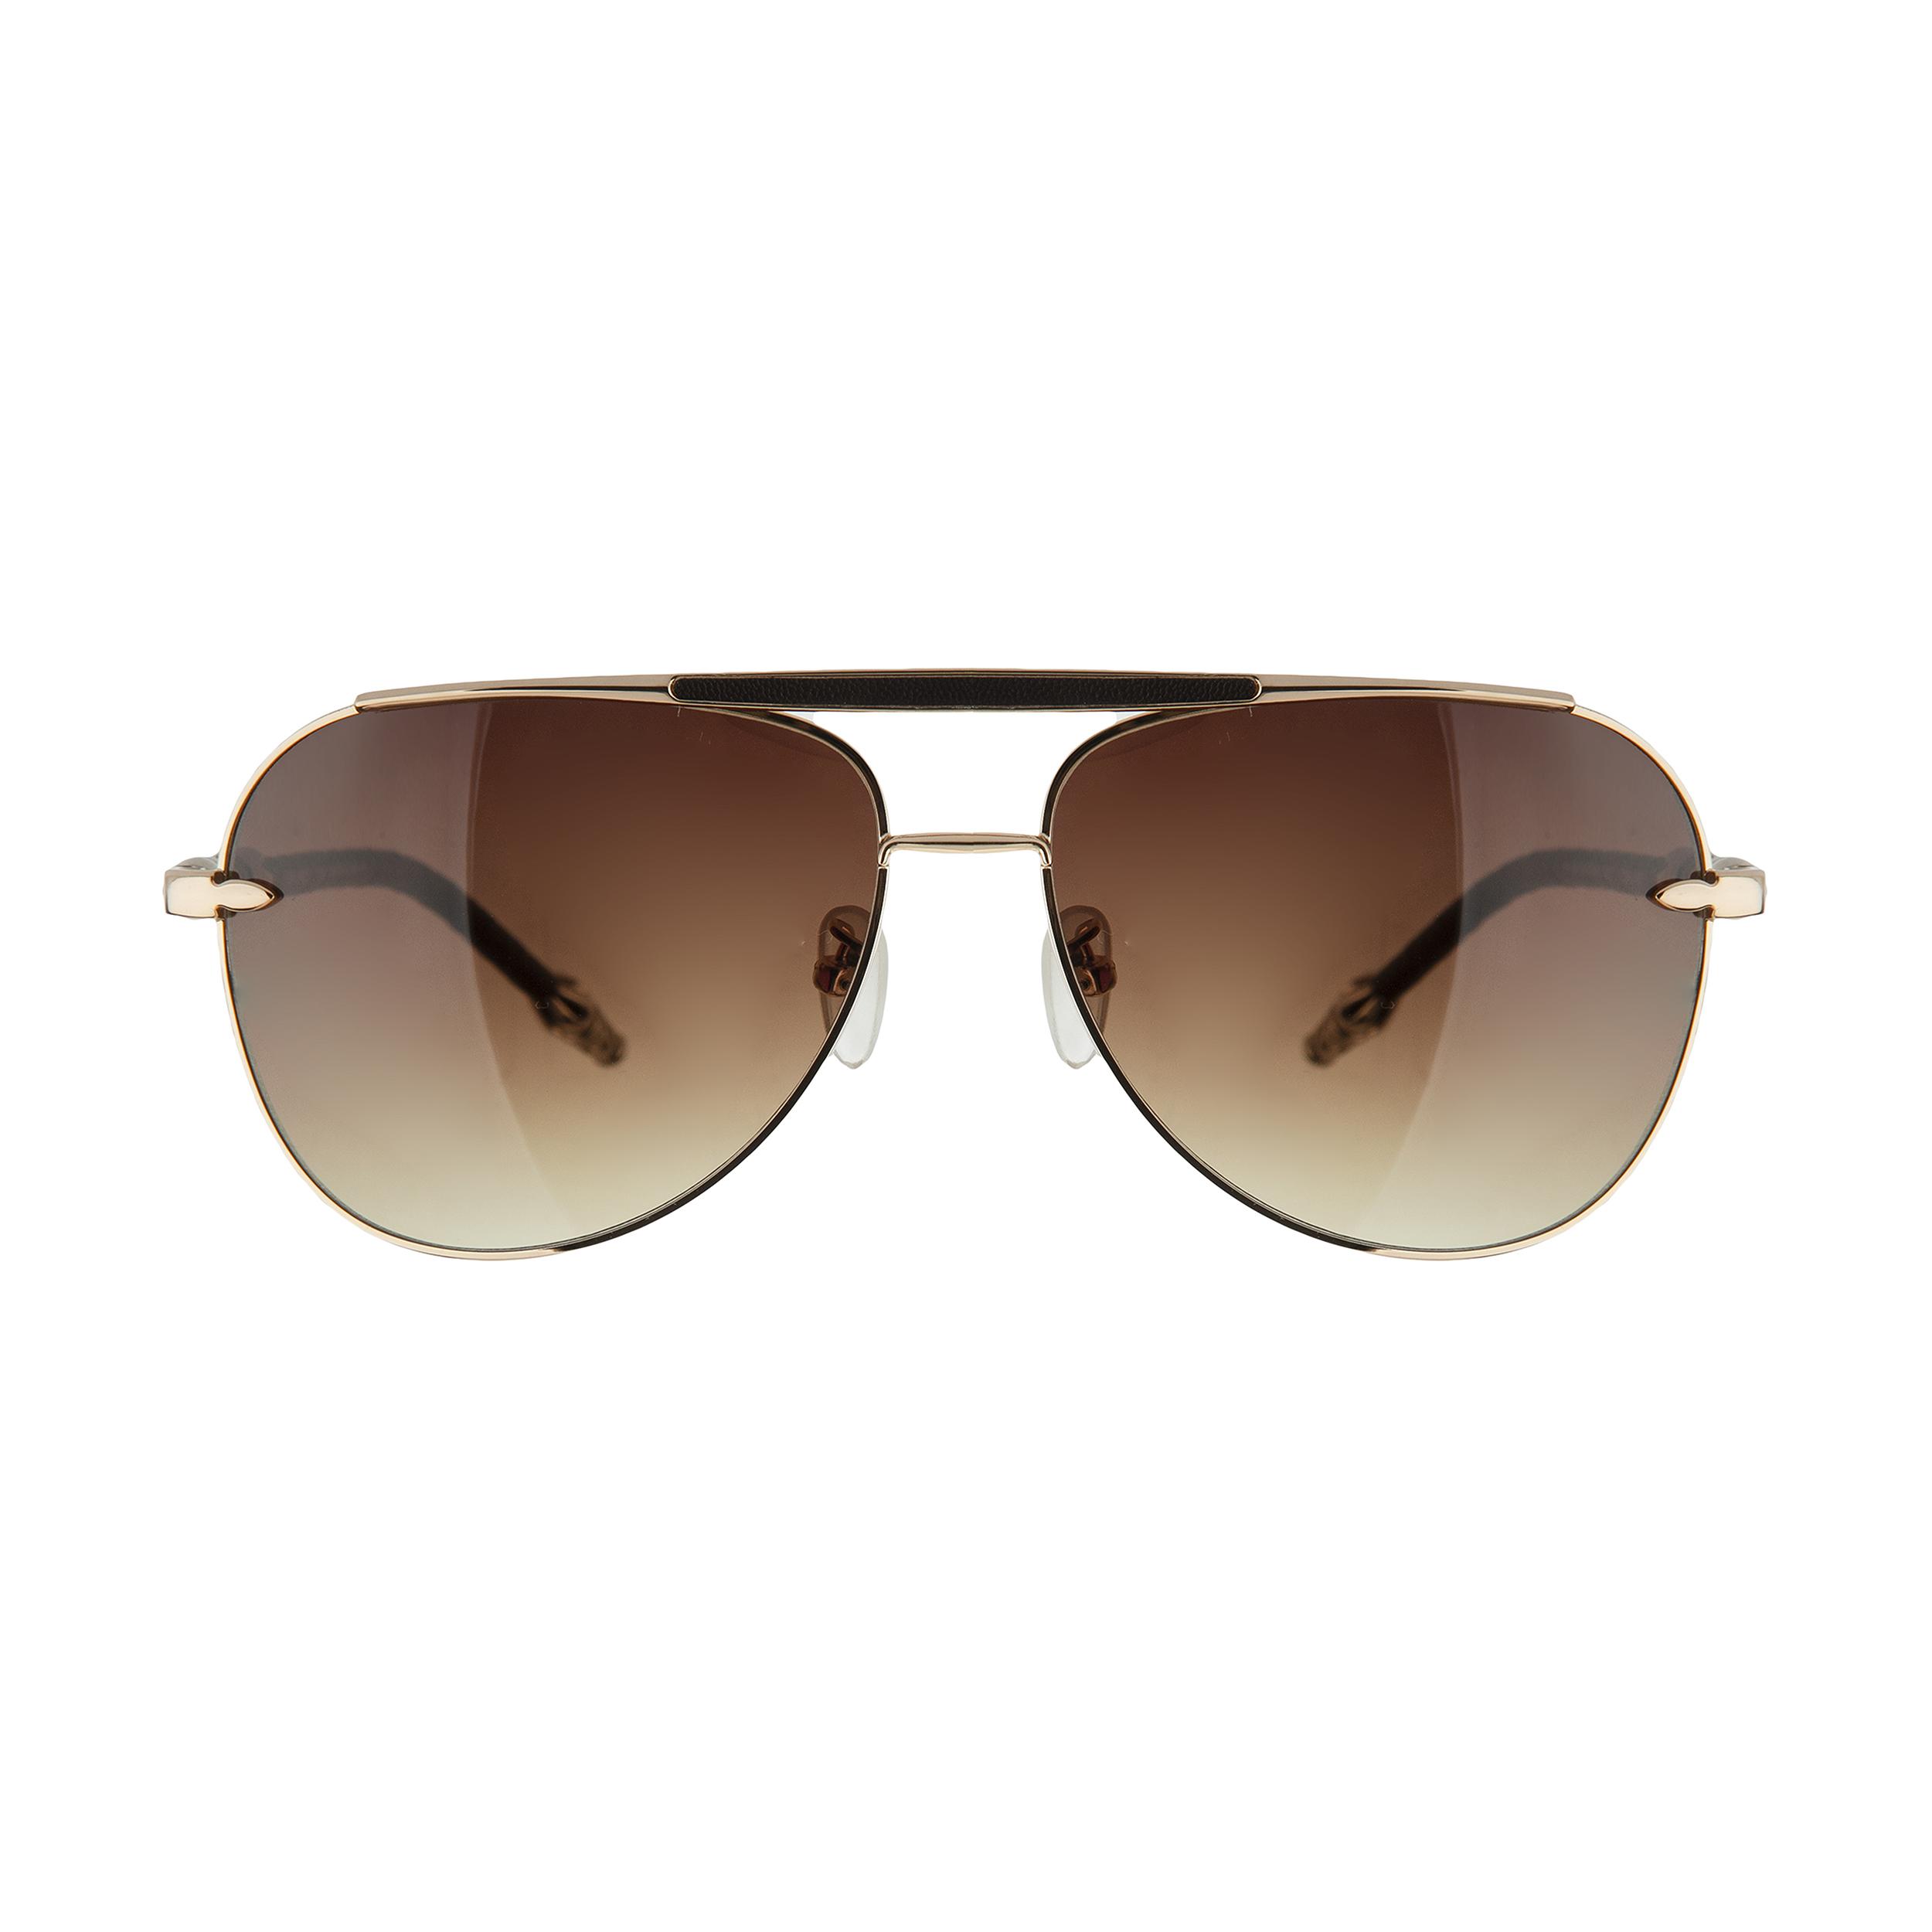 خرید                     عینک آفتابی کروم هارتز مدل Muncher